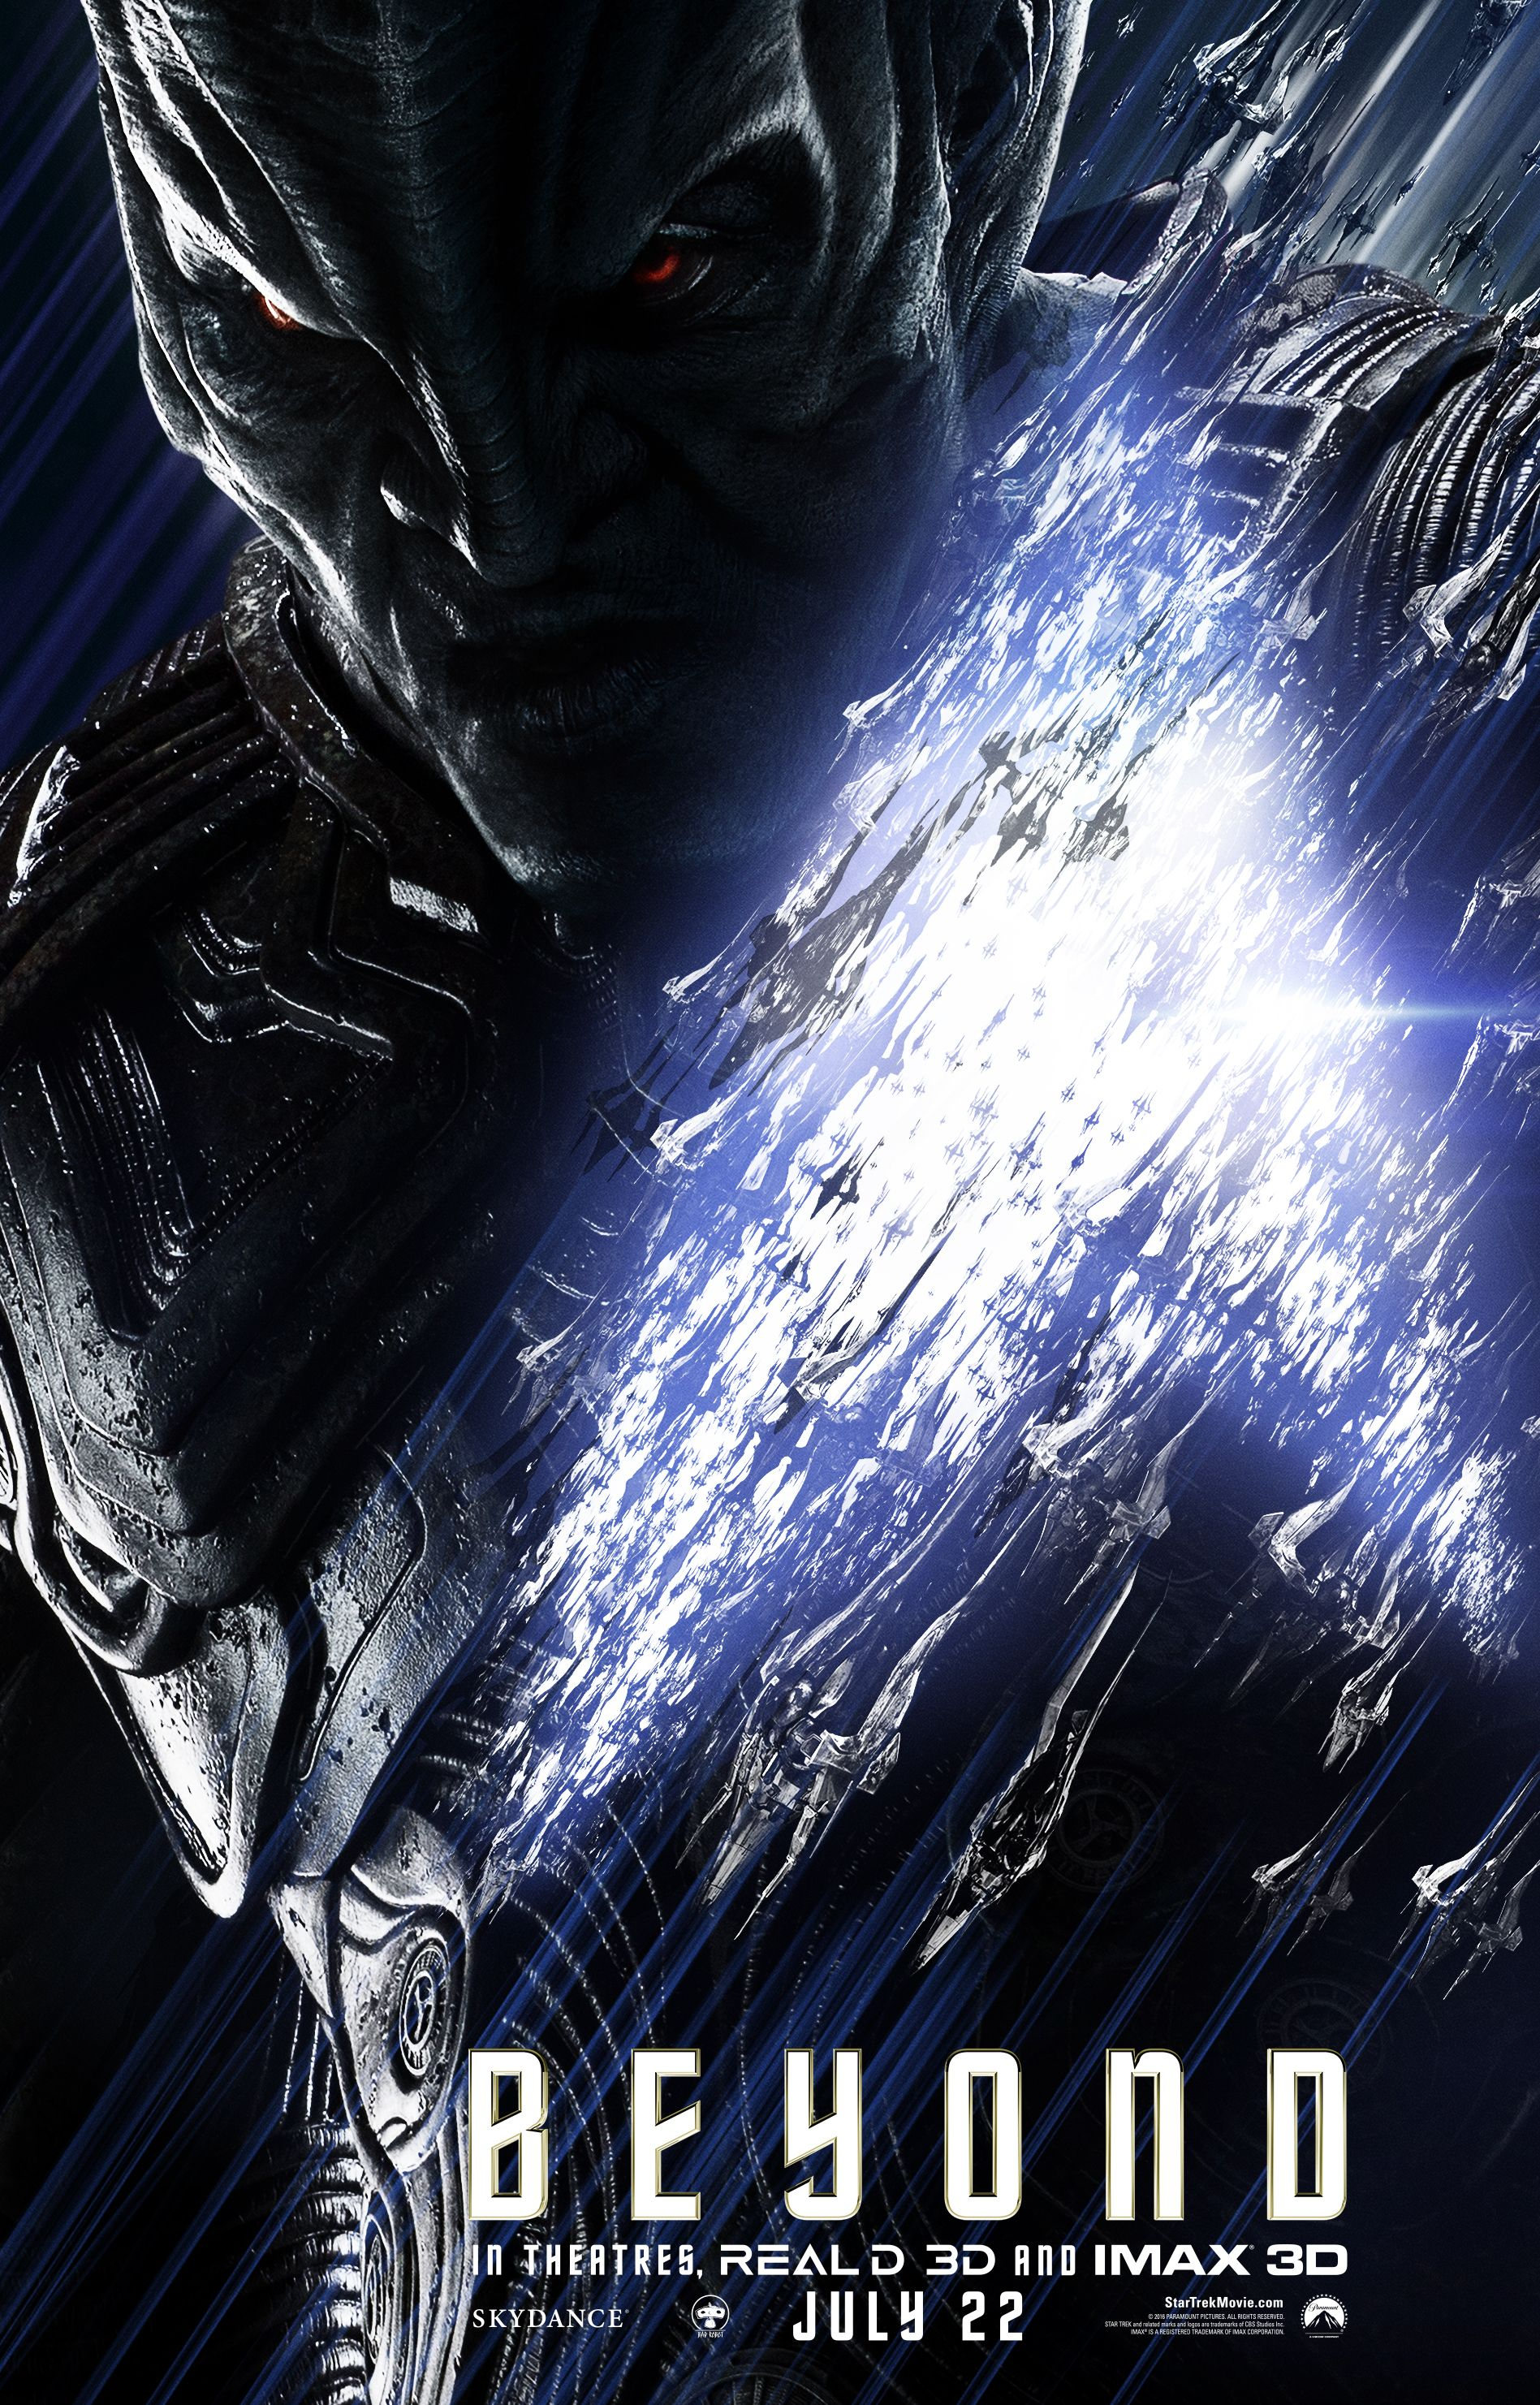 Star Trek Beyond Posters Beam Up Karl Urban Sofia Boutella Collider